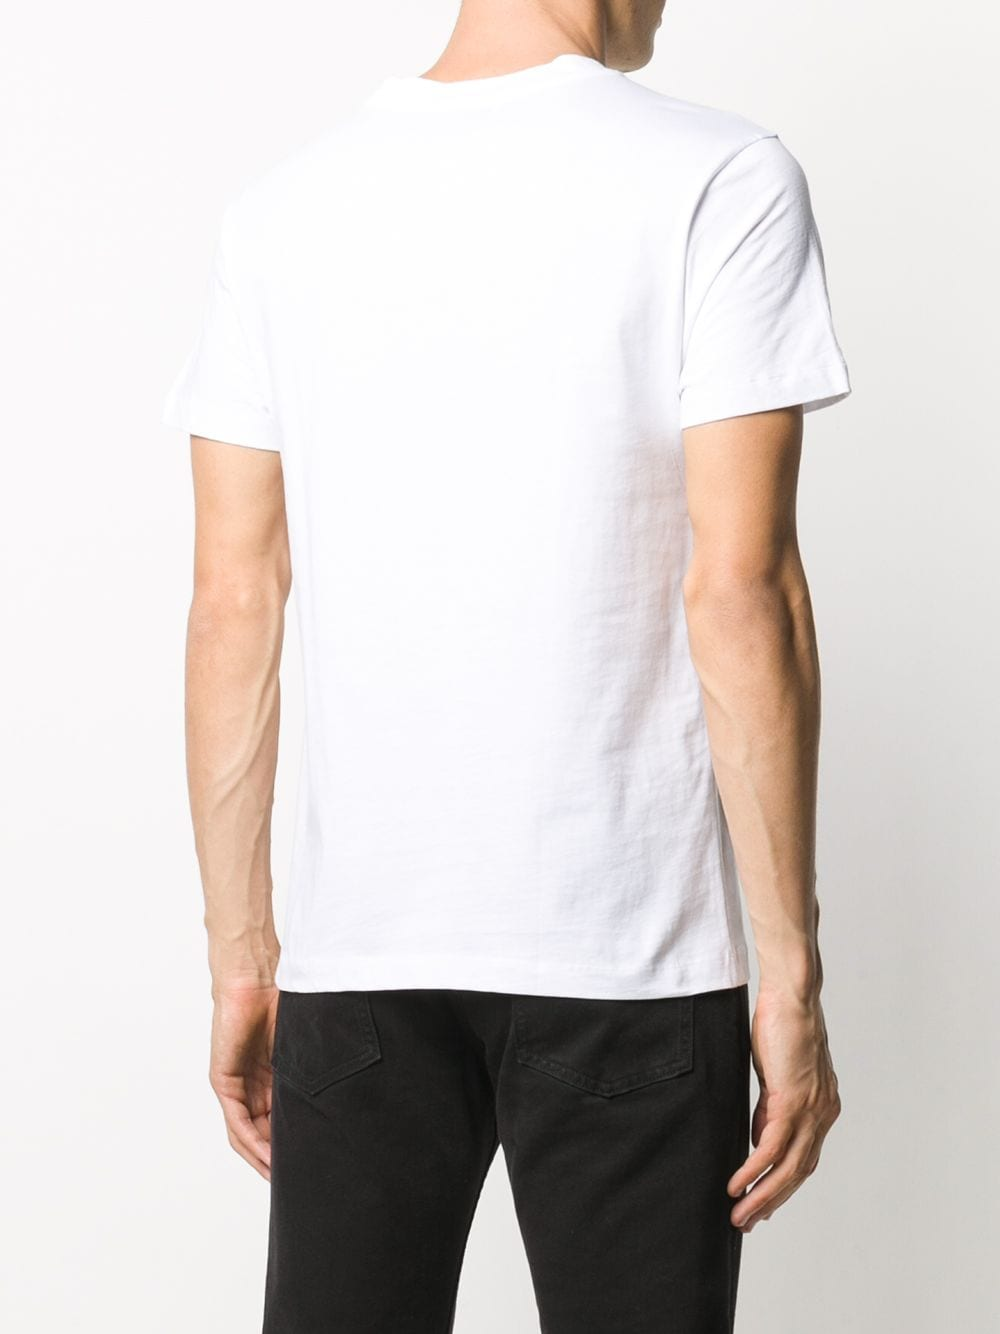 MOON LOGO TEE MARINE SERRE | T-shirts | T035ICONM-JERCO00201